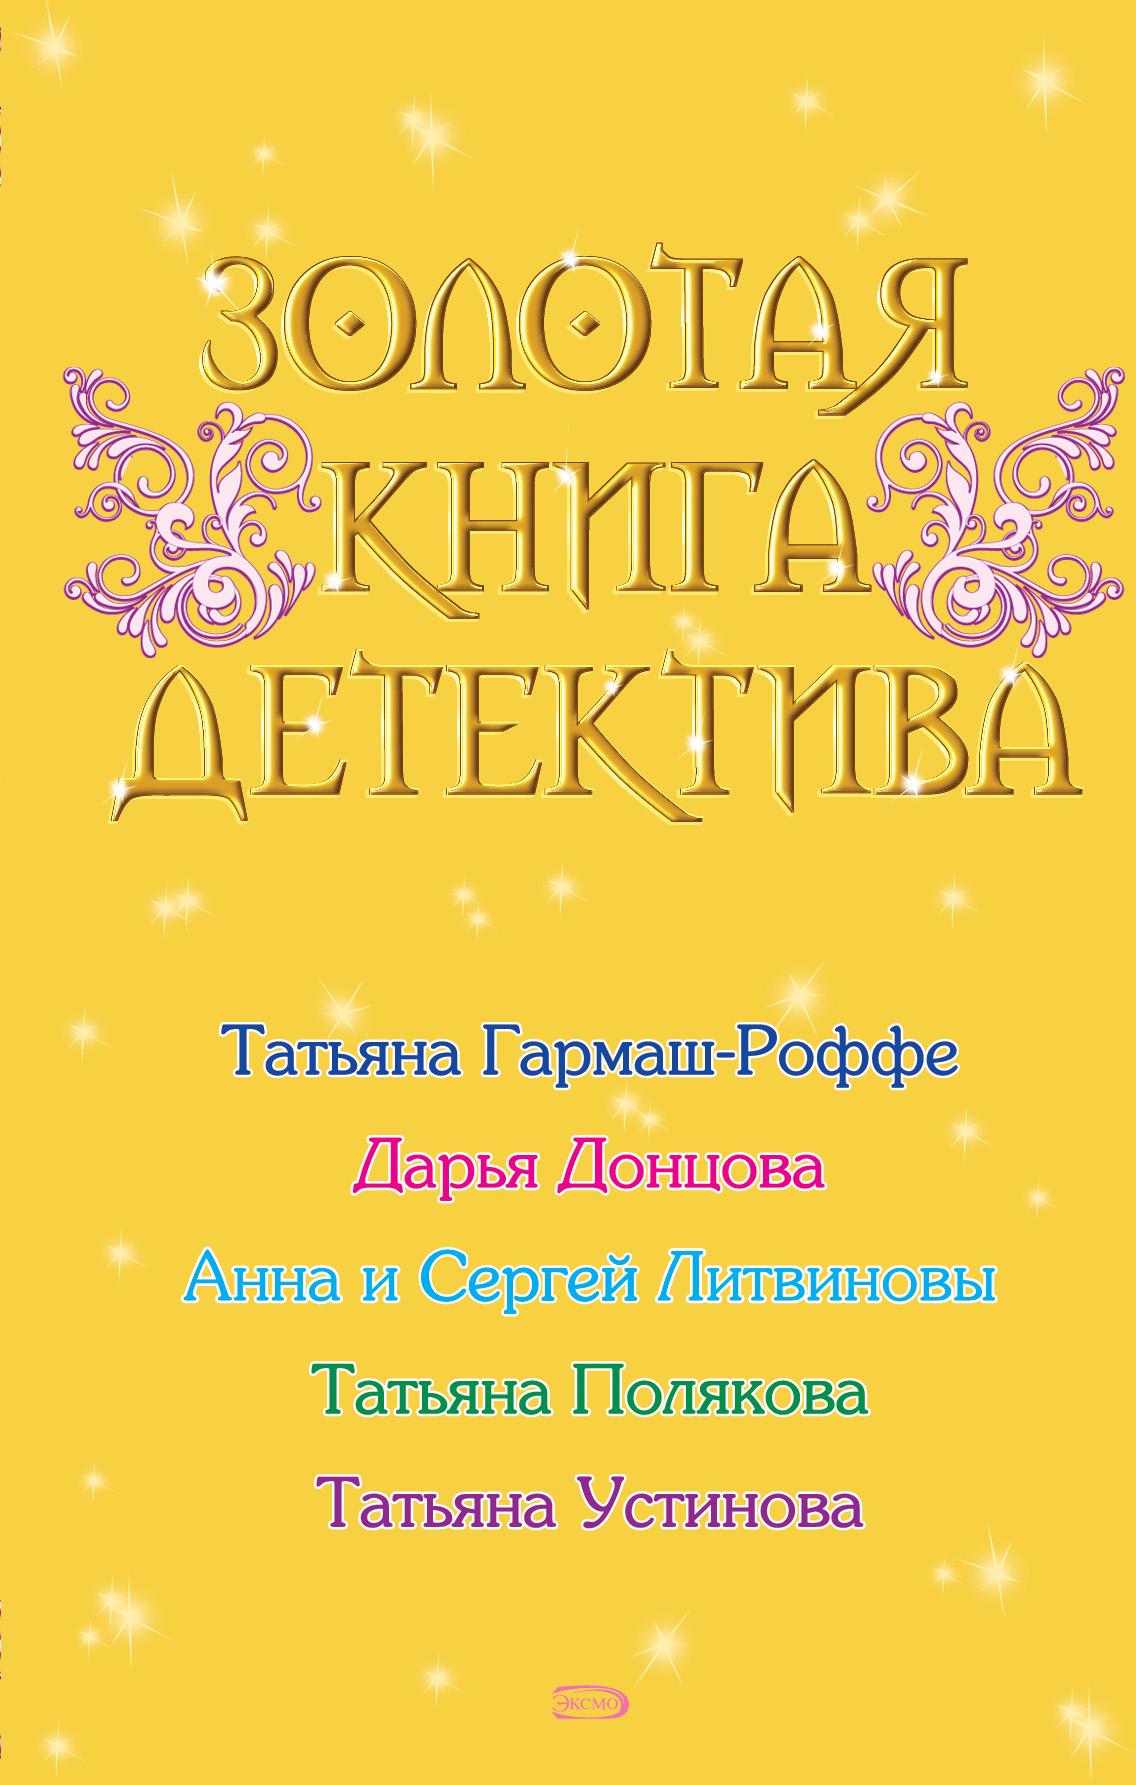 Дарья Донцова Золотая книга детектива (сборник) скляр с ред золотая книга сказок